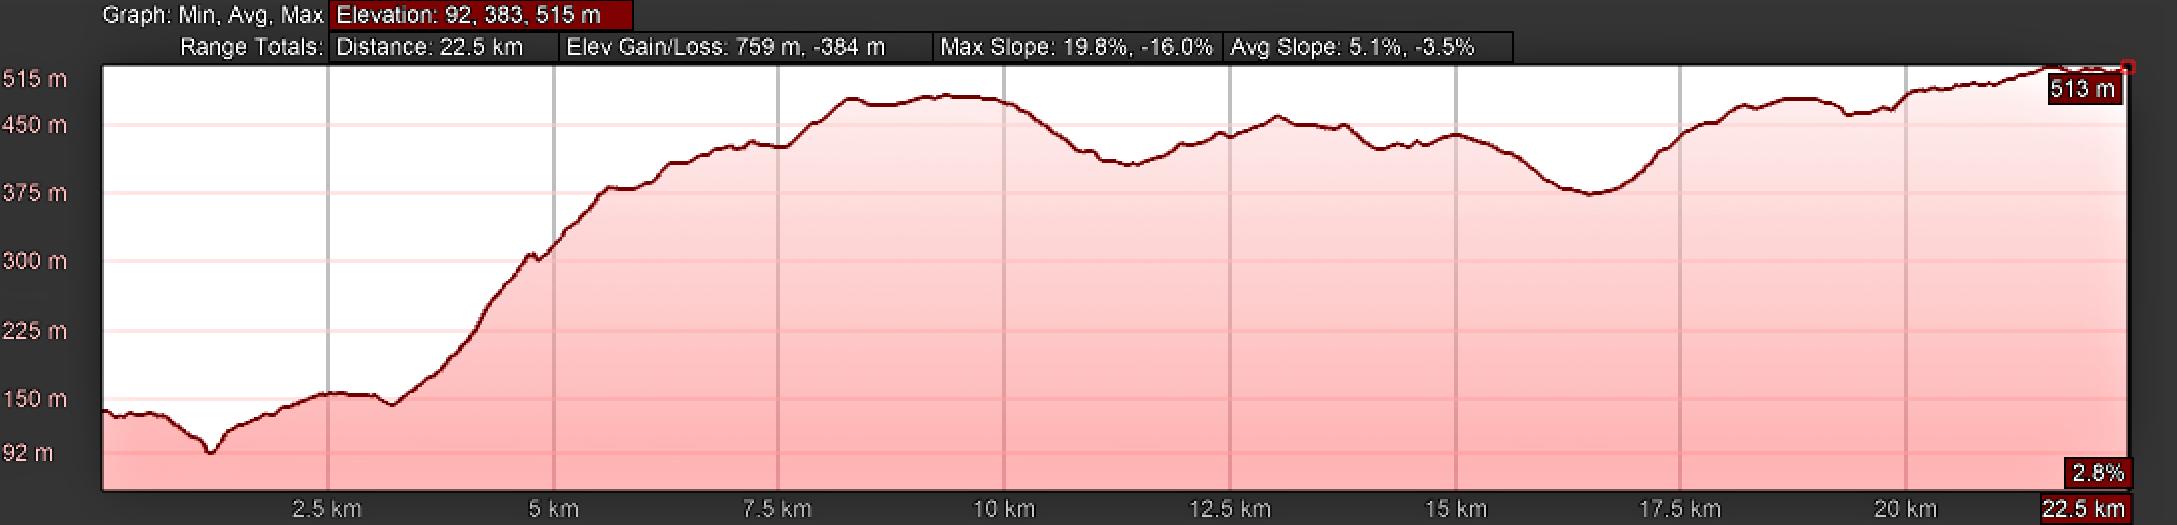 Elevation Profile, Camino Sanabrés, Ourense to Cea